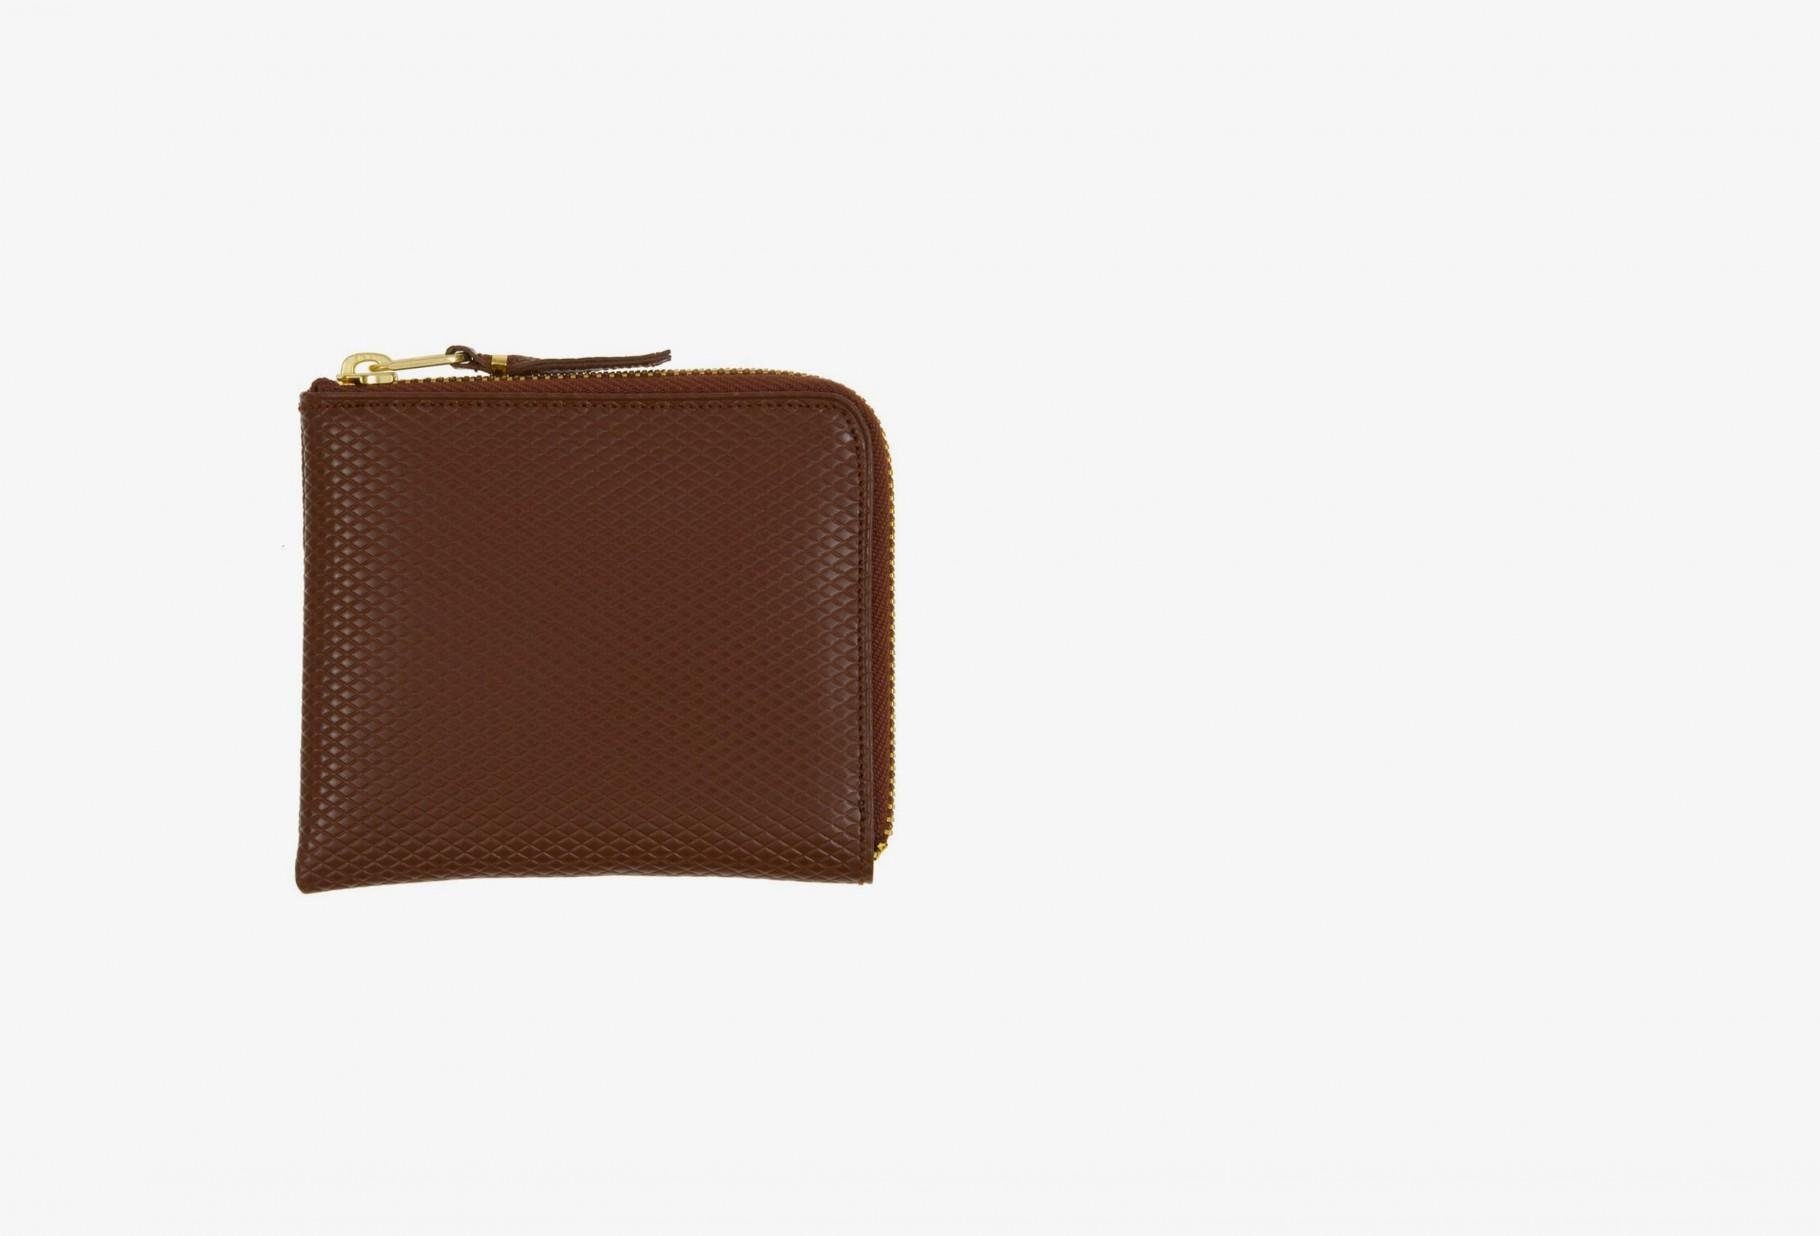 COMME DES GARÇONS WALLETS / Cdg luxury group sa3100lg Brown